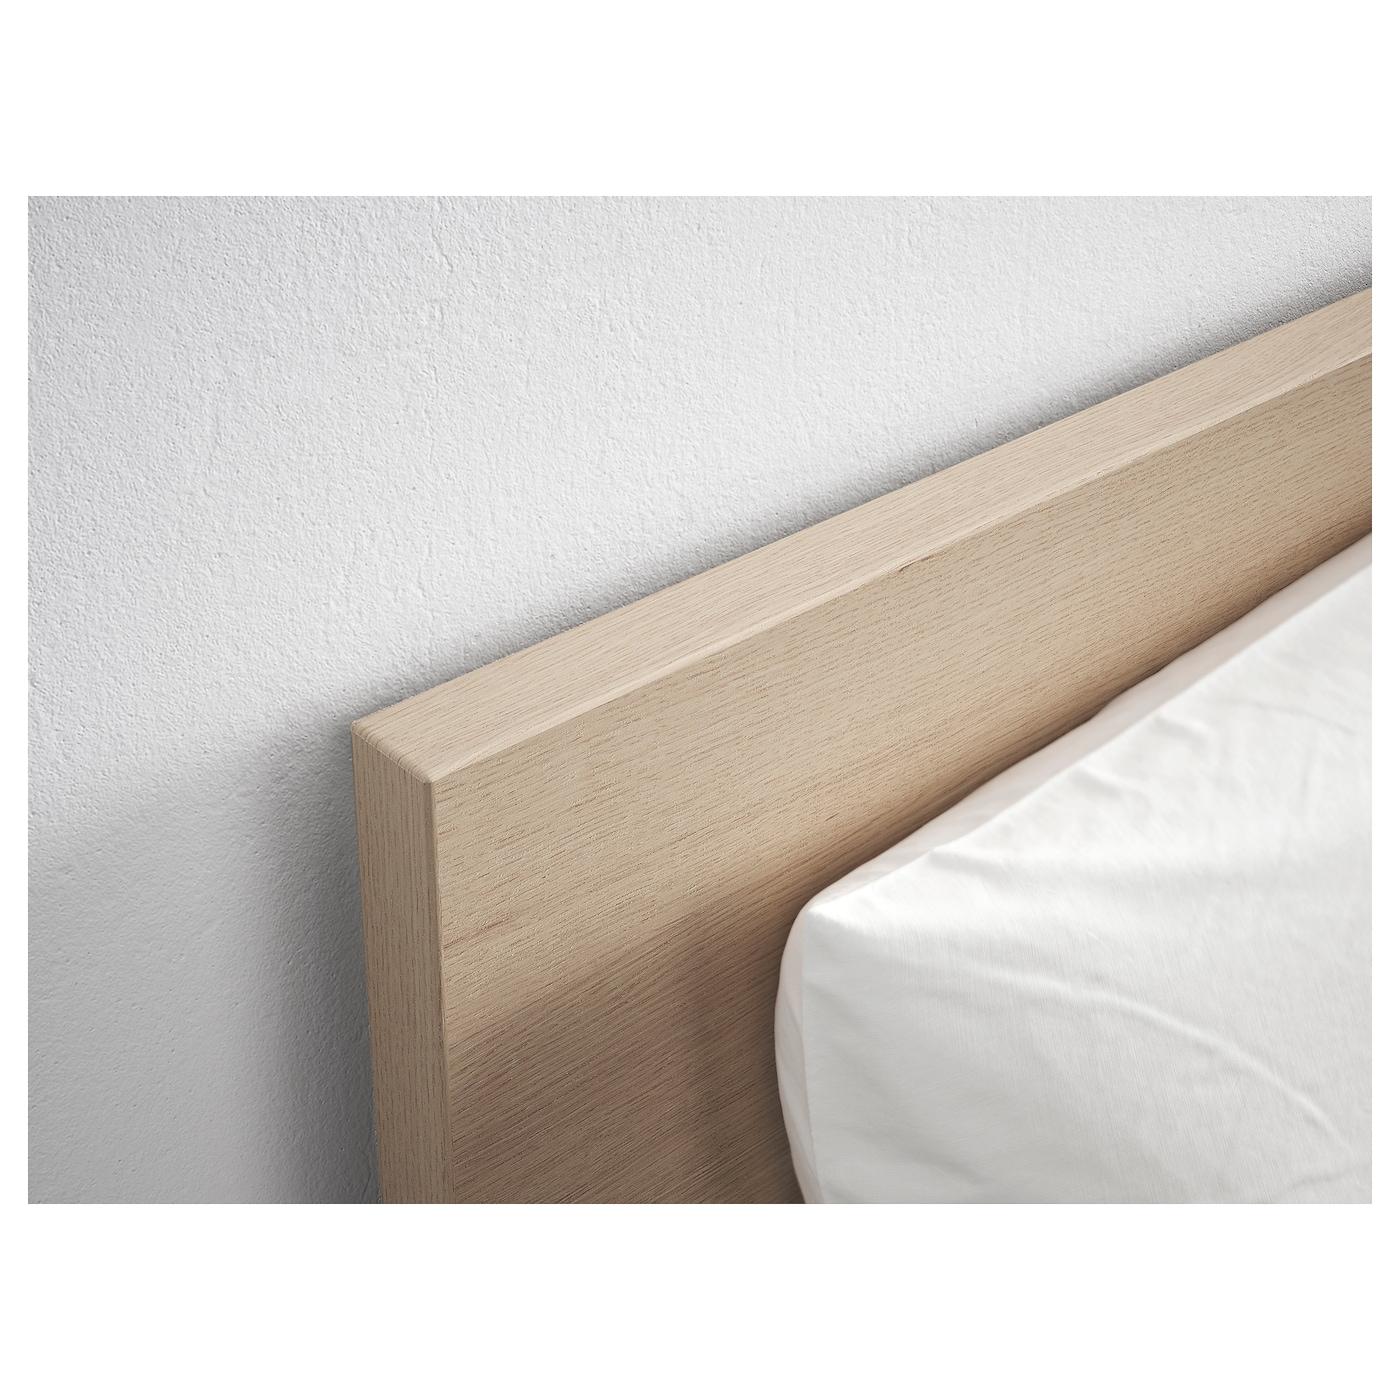 Malm estructura de cama alta chapa roble tinte blanco for Estructura cama alta